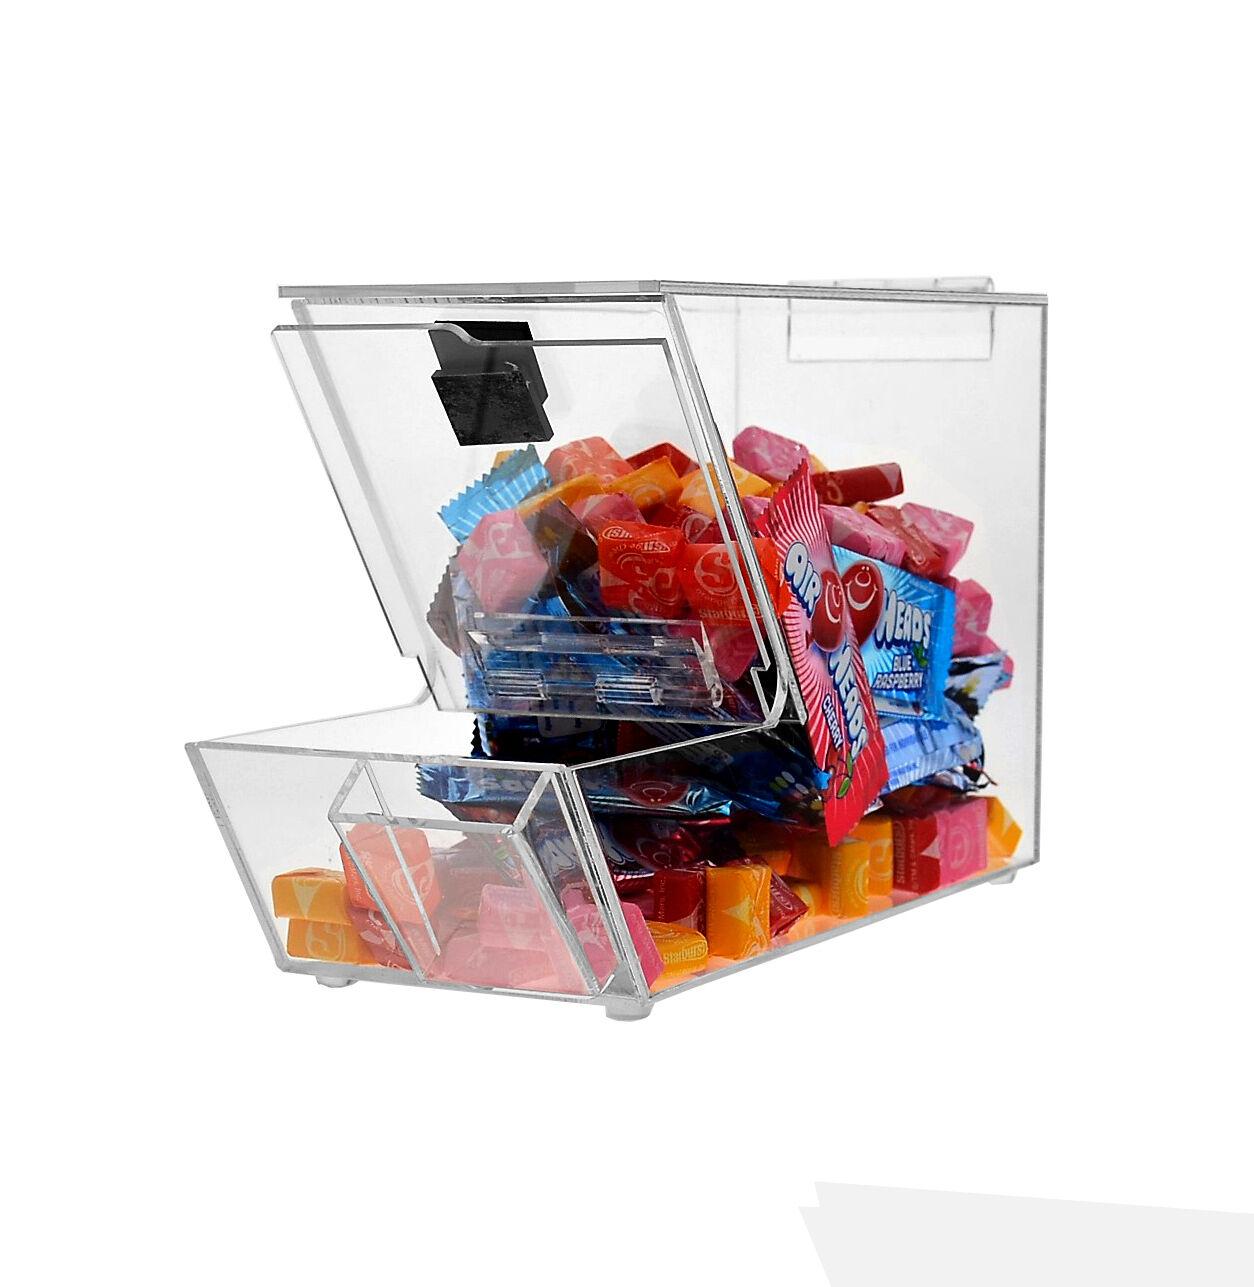 Acrylique CANDY Bin, sec Foods, Haricots, jouets bacs Holder Display Box Comptoir Avec